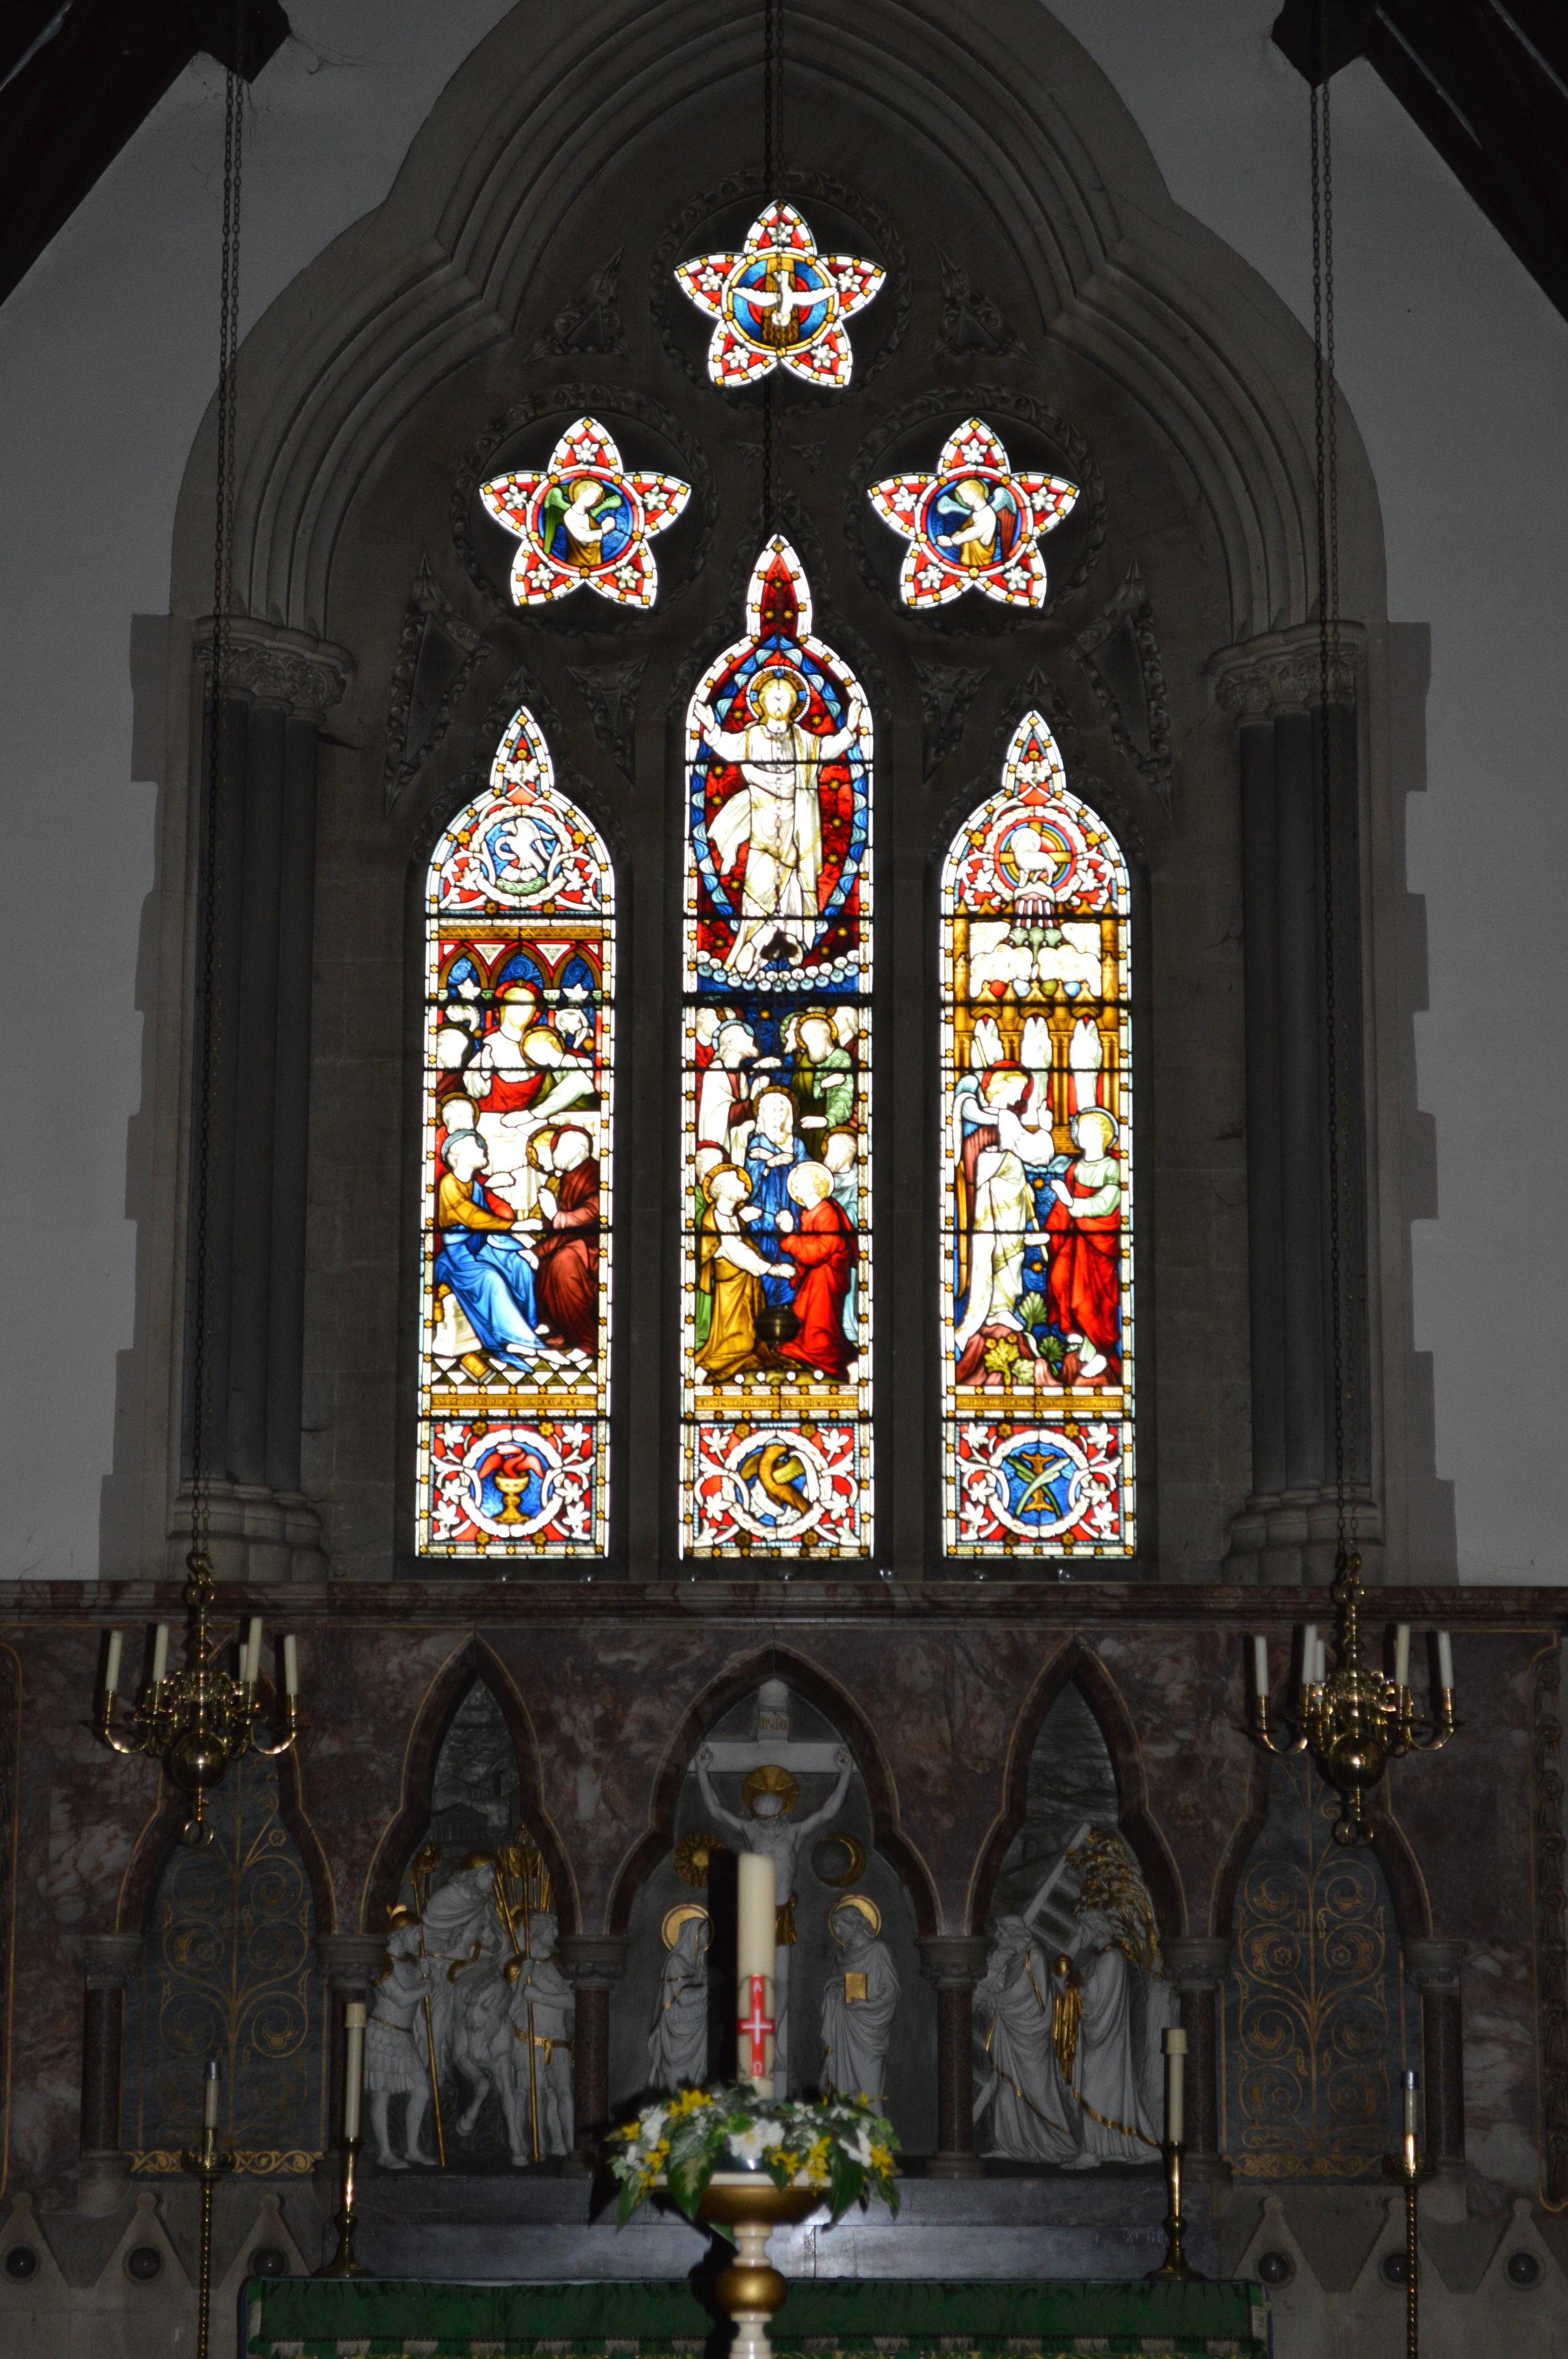 St Johns Altar Window